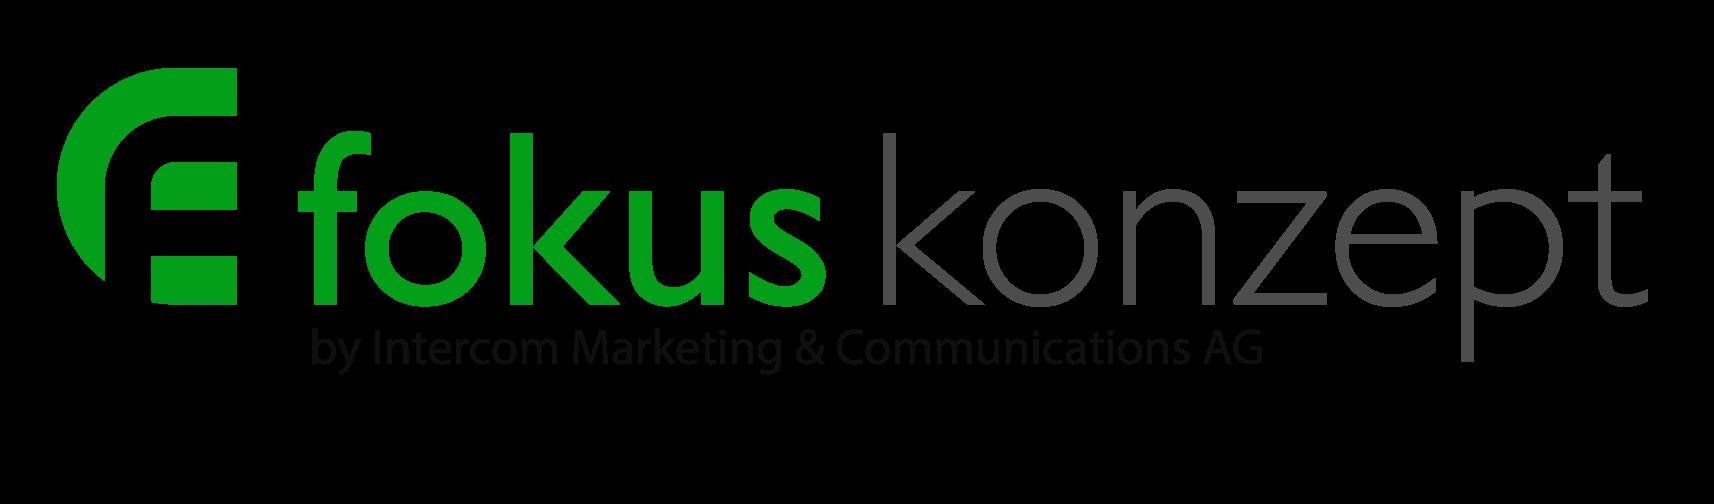 fokus konzept by Intercom Marketing & Communications AG